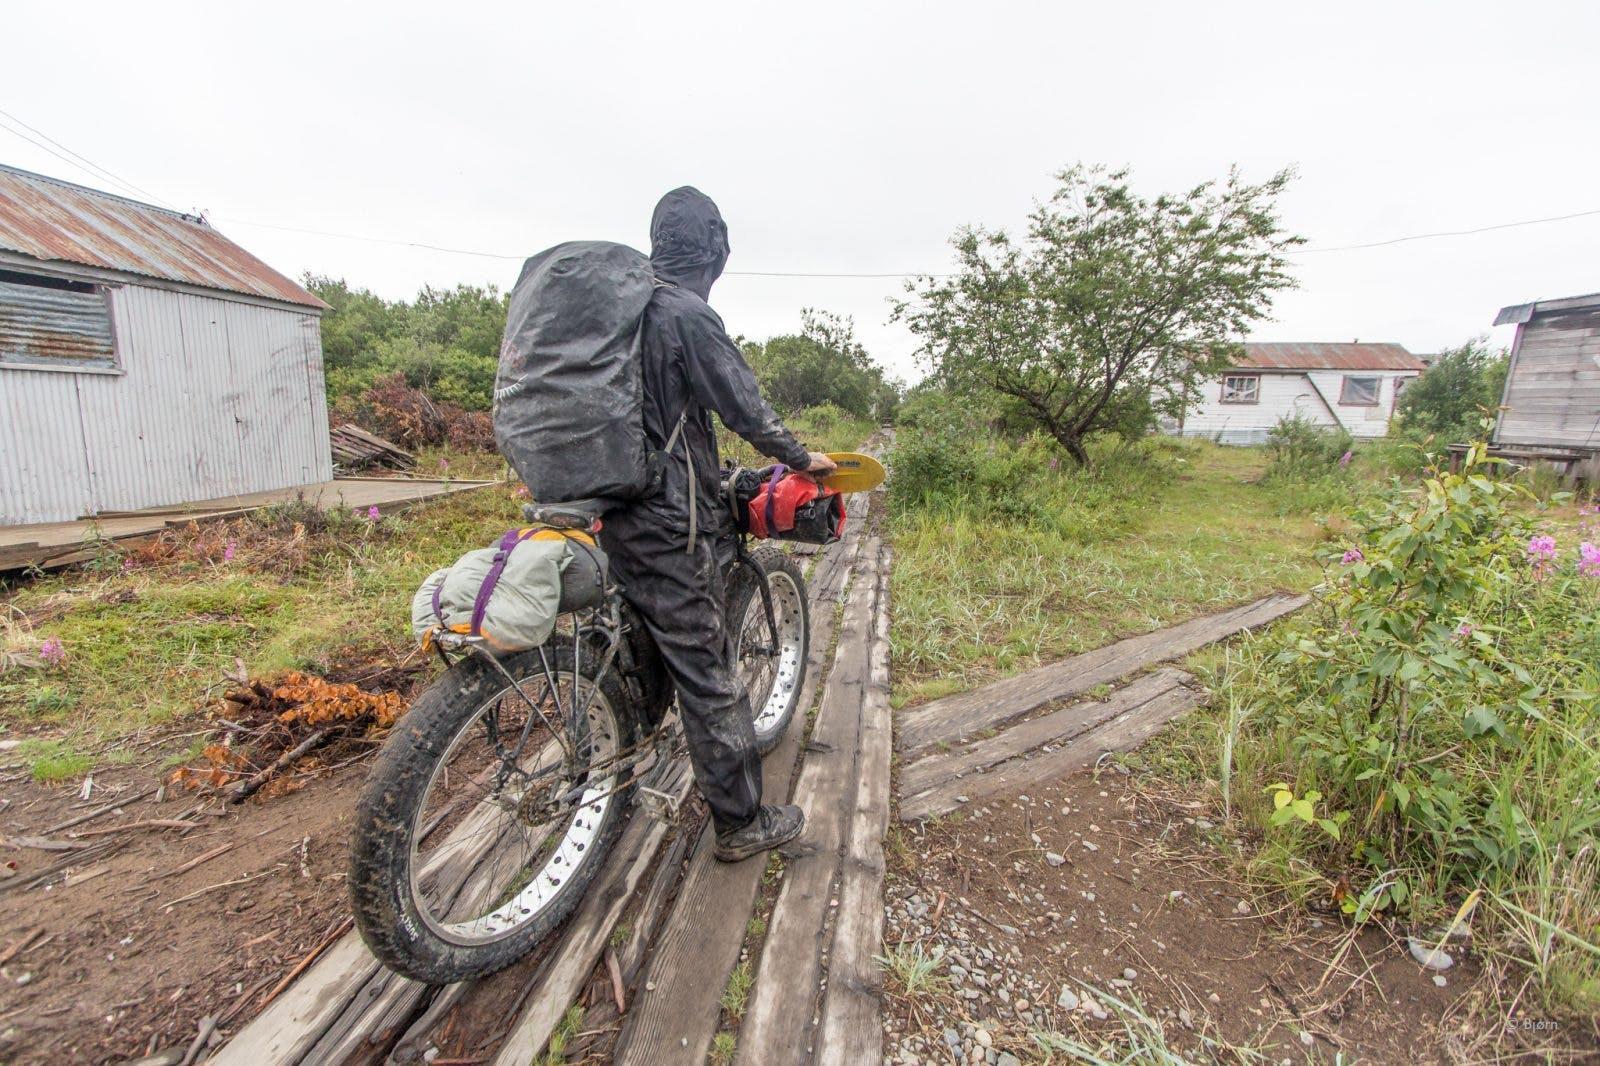 Riding through a village during Bjørn Olson's trip from Cook Inlet to Bristol Bay.